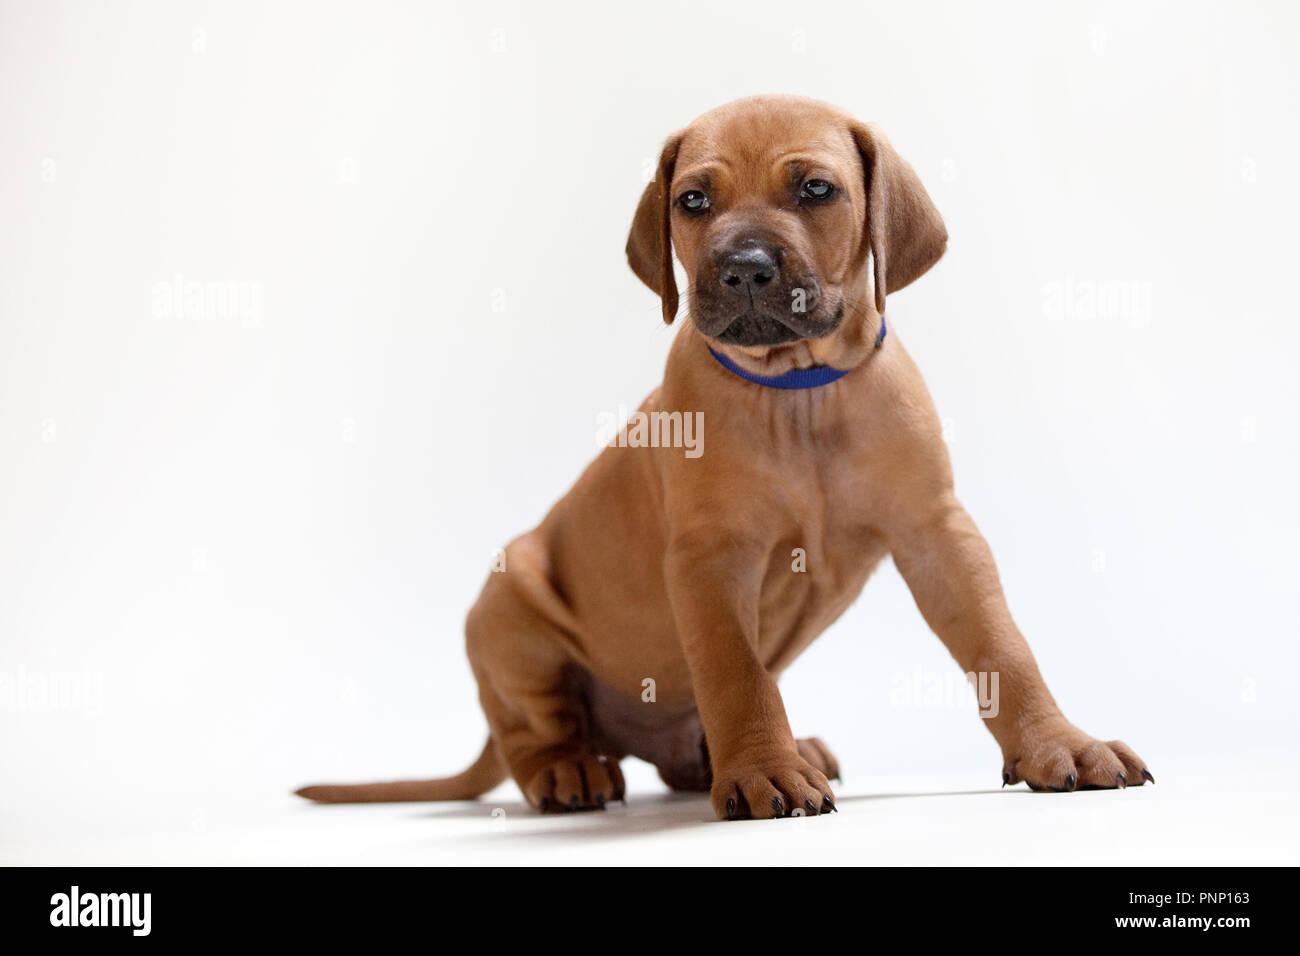 A Rhodesian Ridgeback puppy - Stock Image